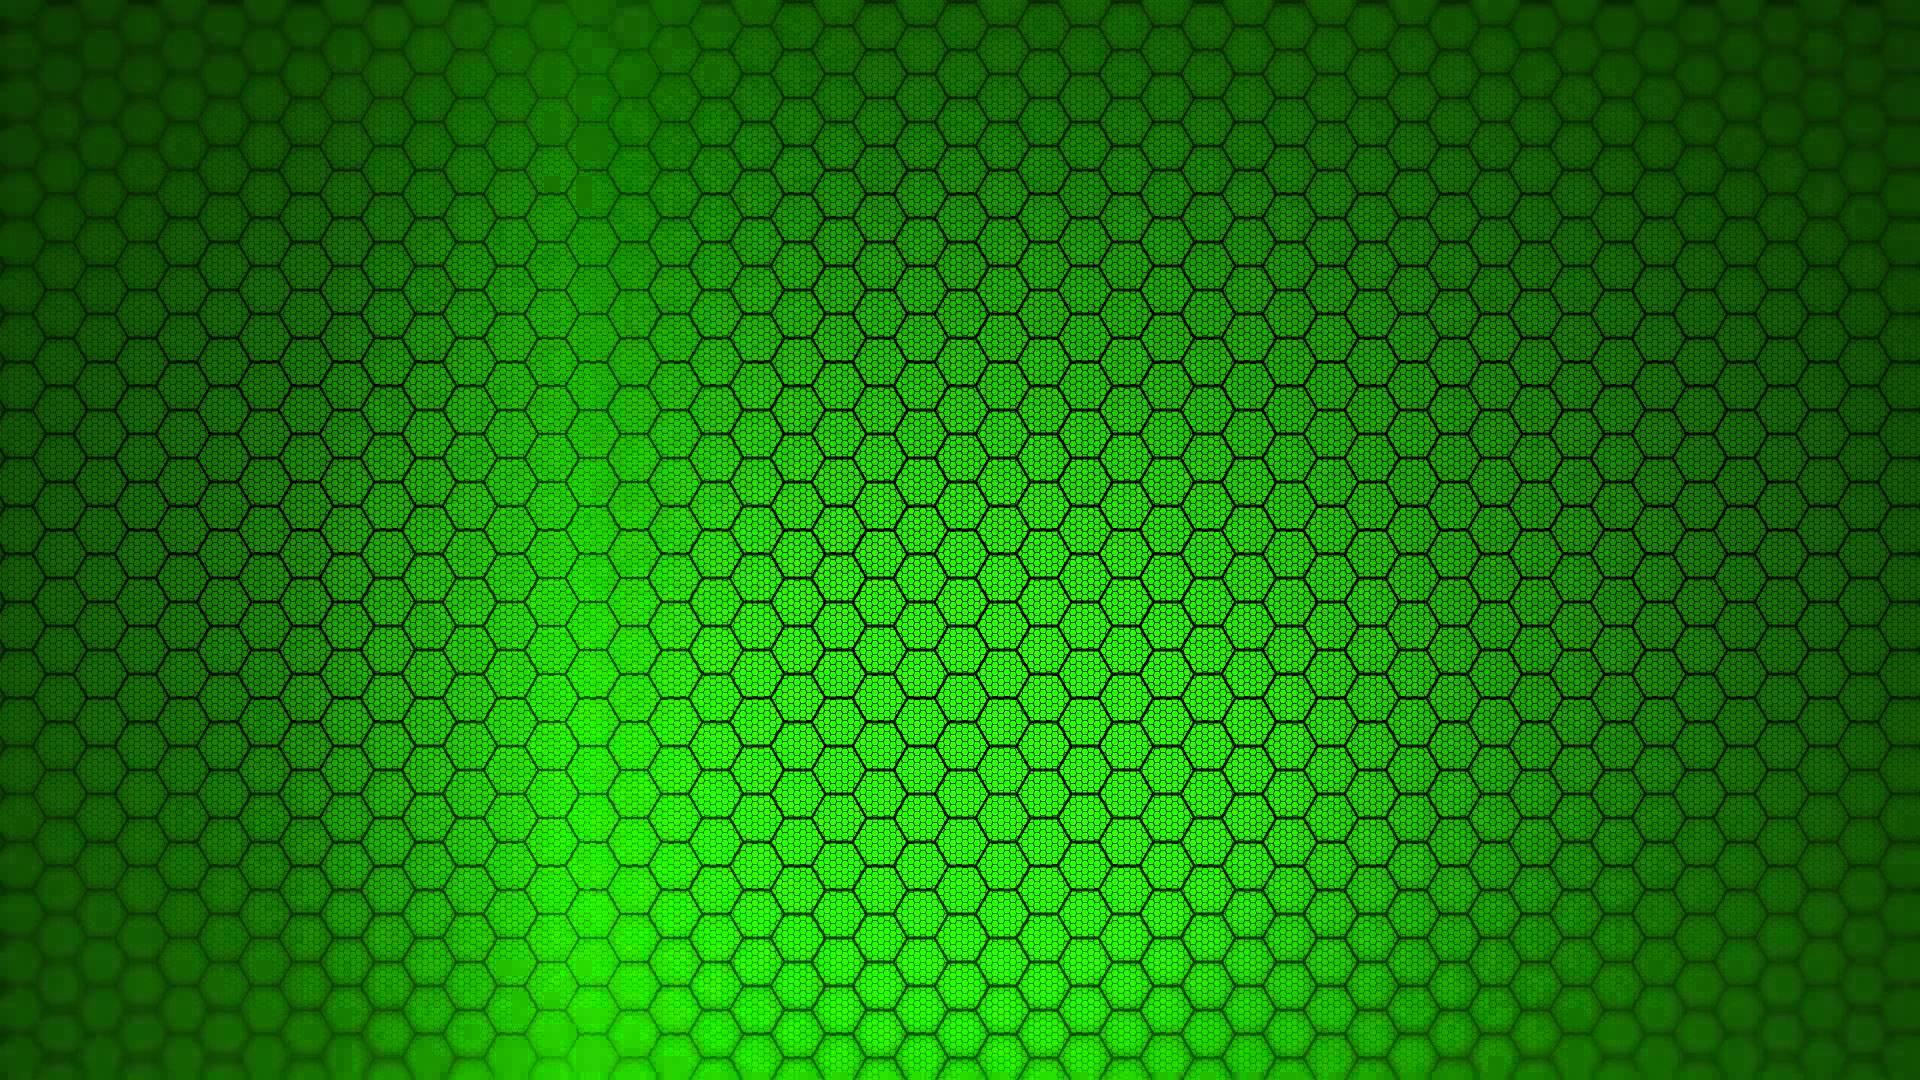 Hexagon Background - Green Screen Animation